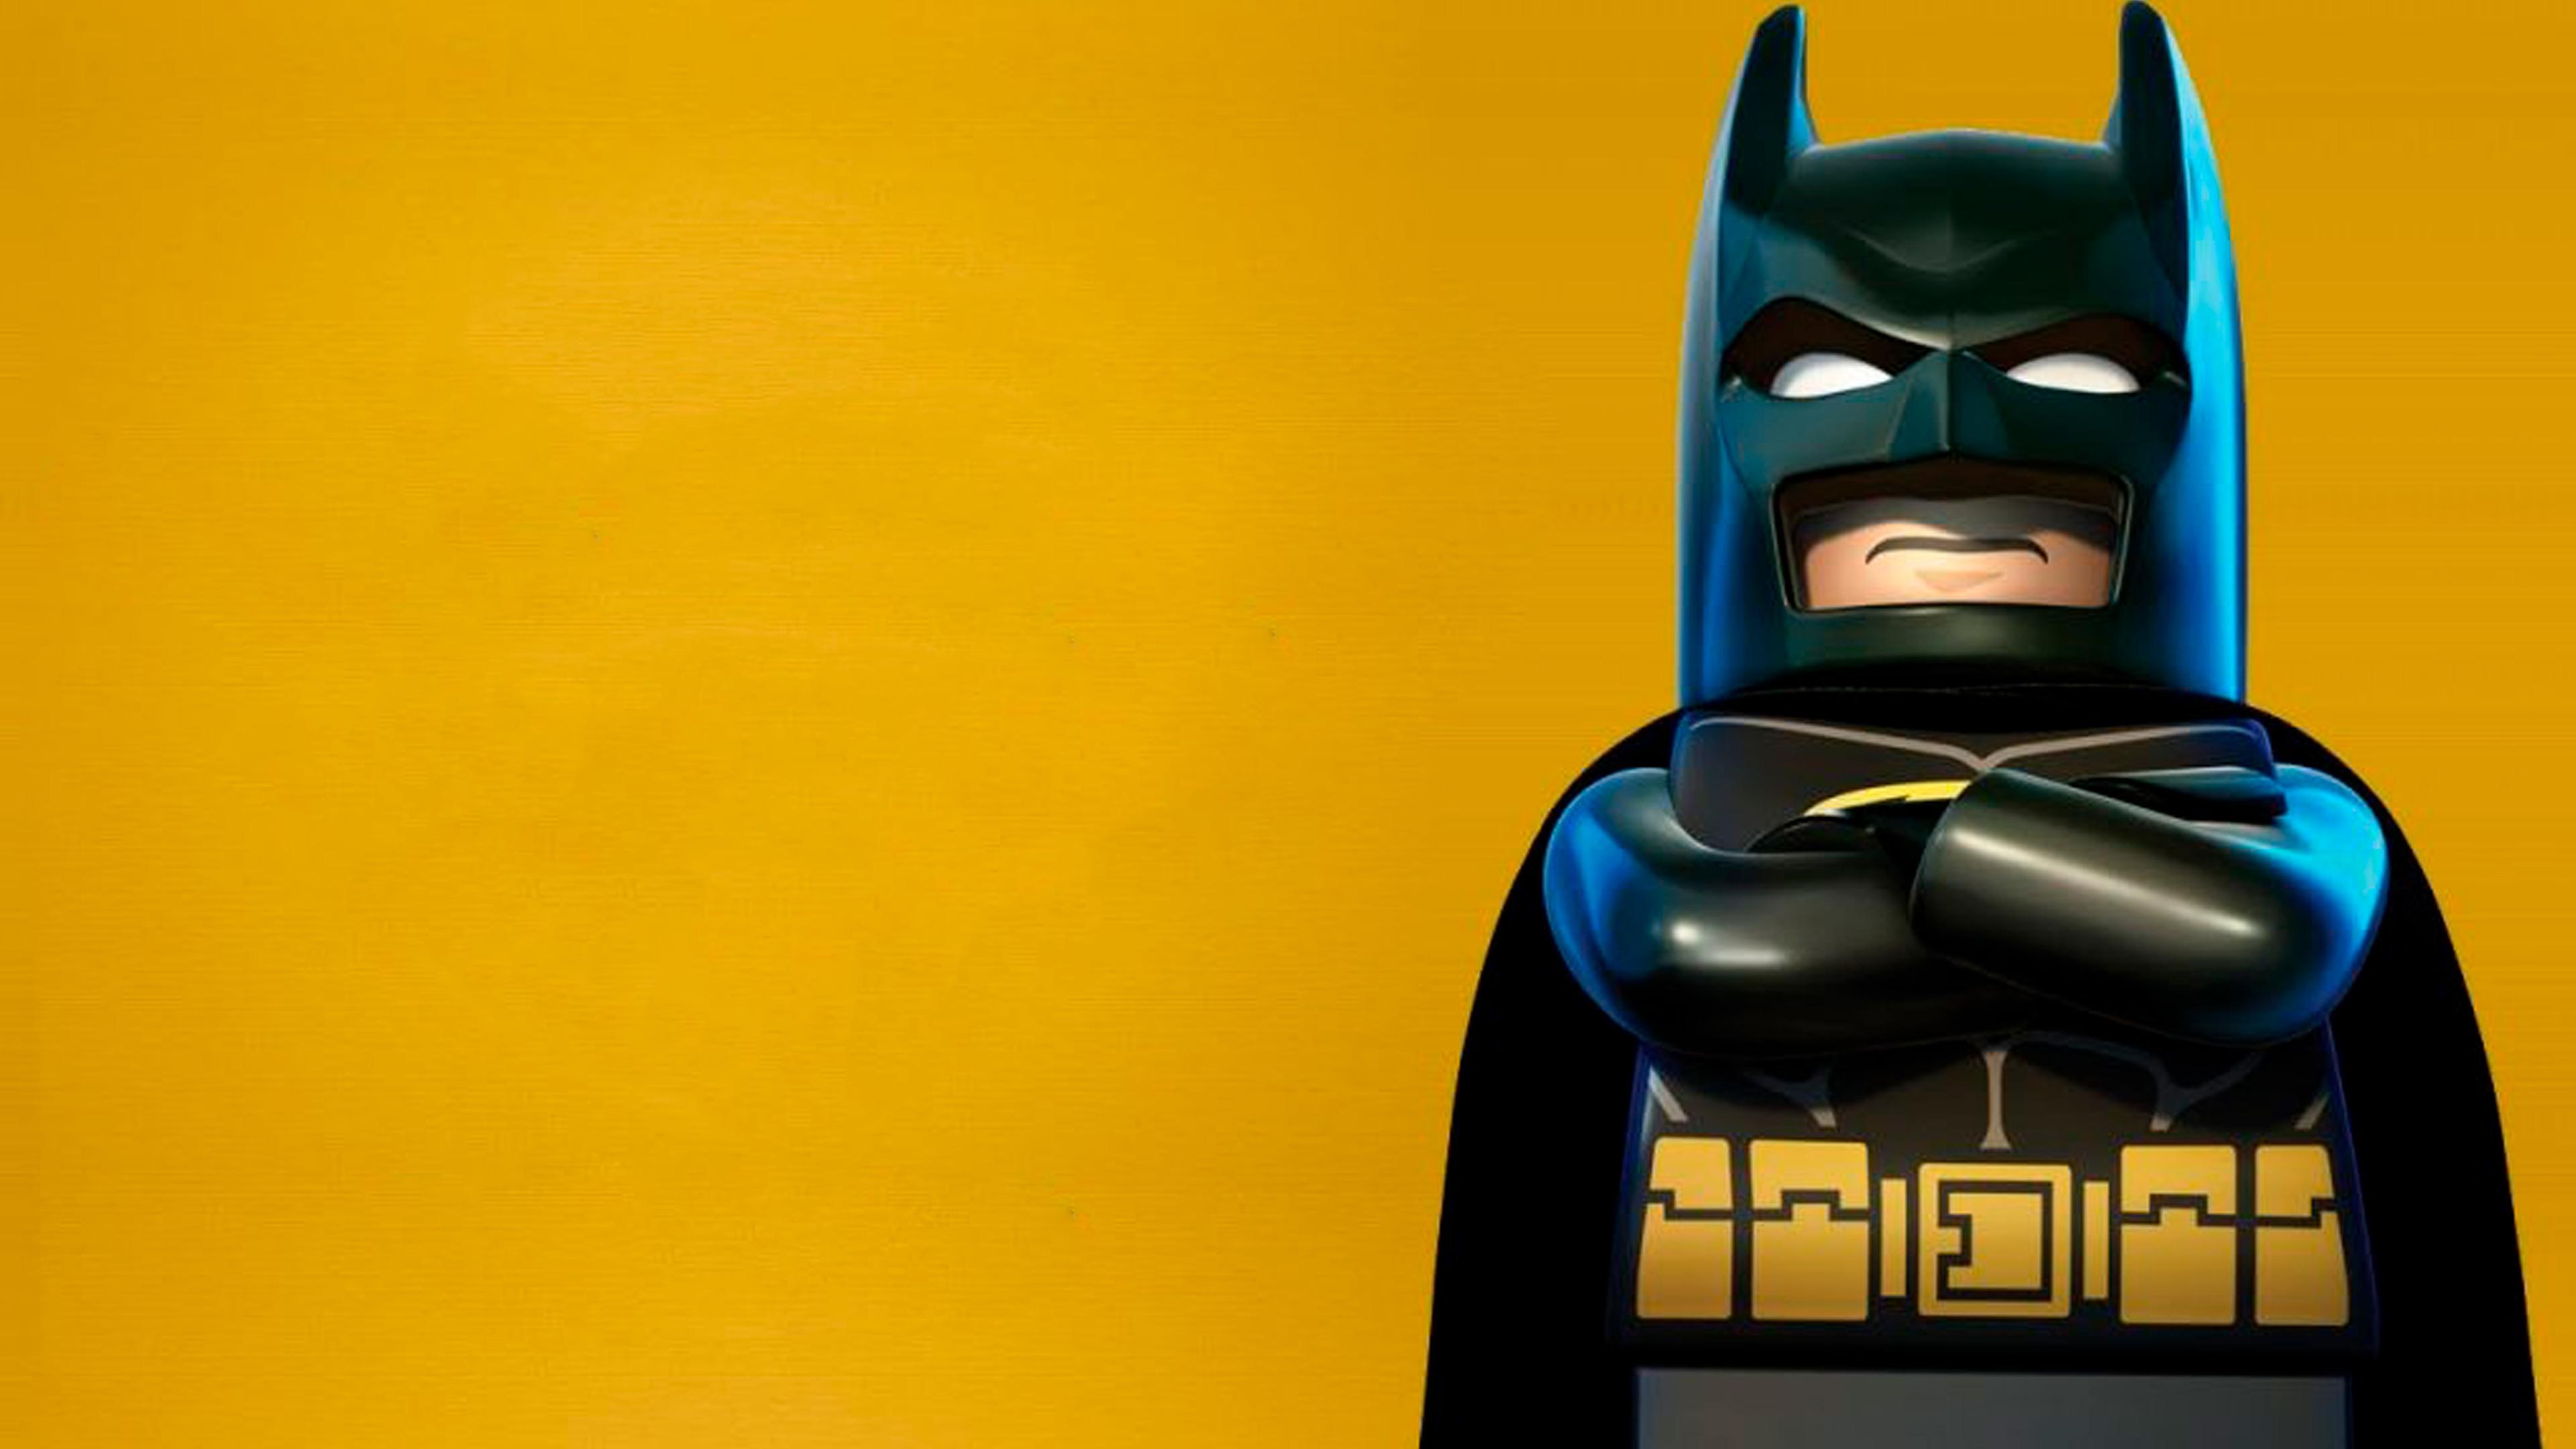 lego batman 1537644287 - Lego Batman - the lego batman movie wallpapers, movies wallpapers, hd-wallpapers, batman wallpapers, animated movies wallpapers, 4k-wallpapers, 2018-movies-wallpapers